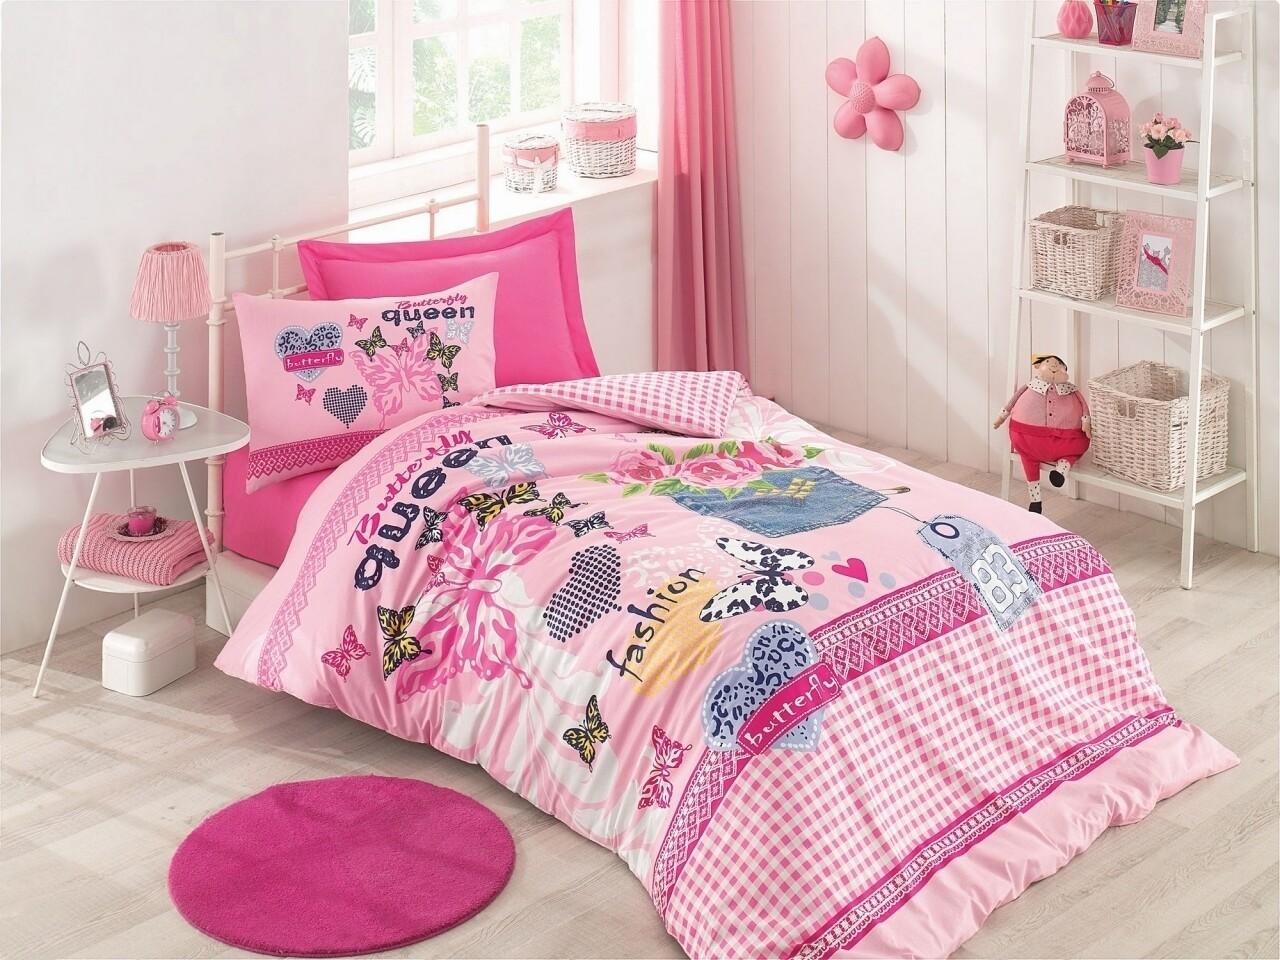 Lenjerie de pat pentru o persoana, 3 piese, 100% bumbac ranforce, Cotton Box, Queen